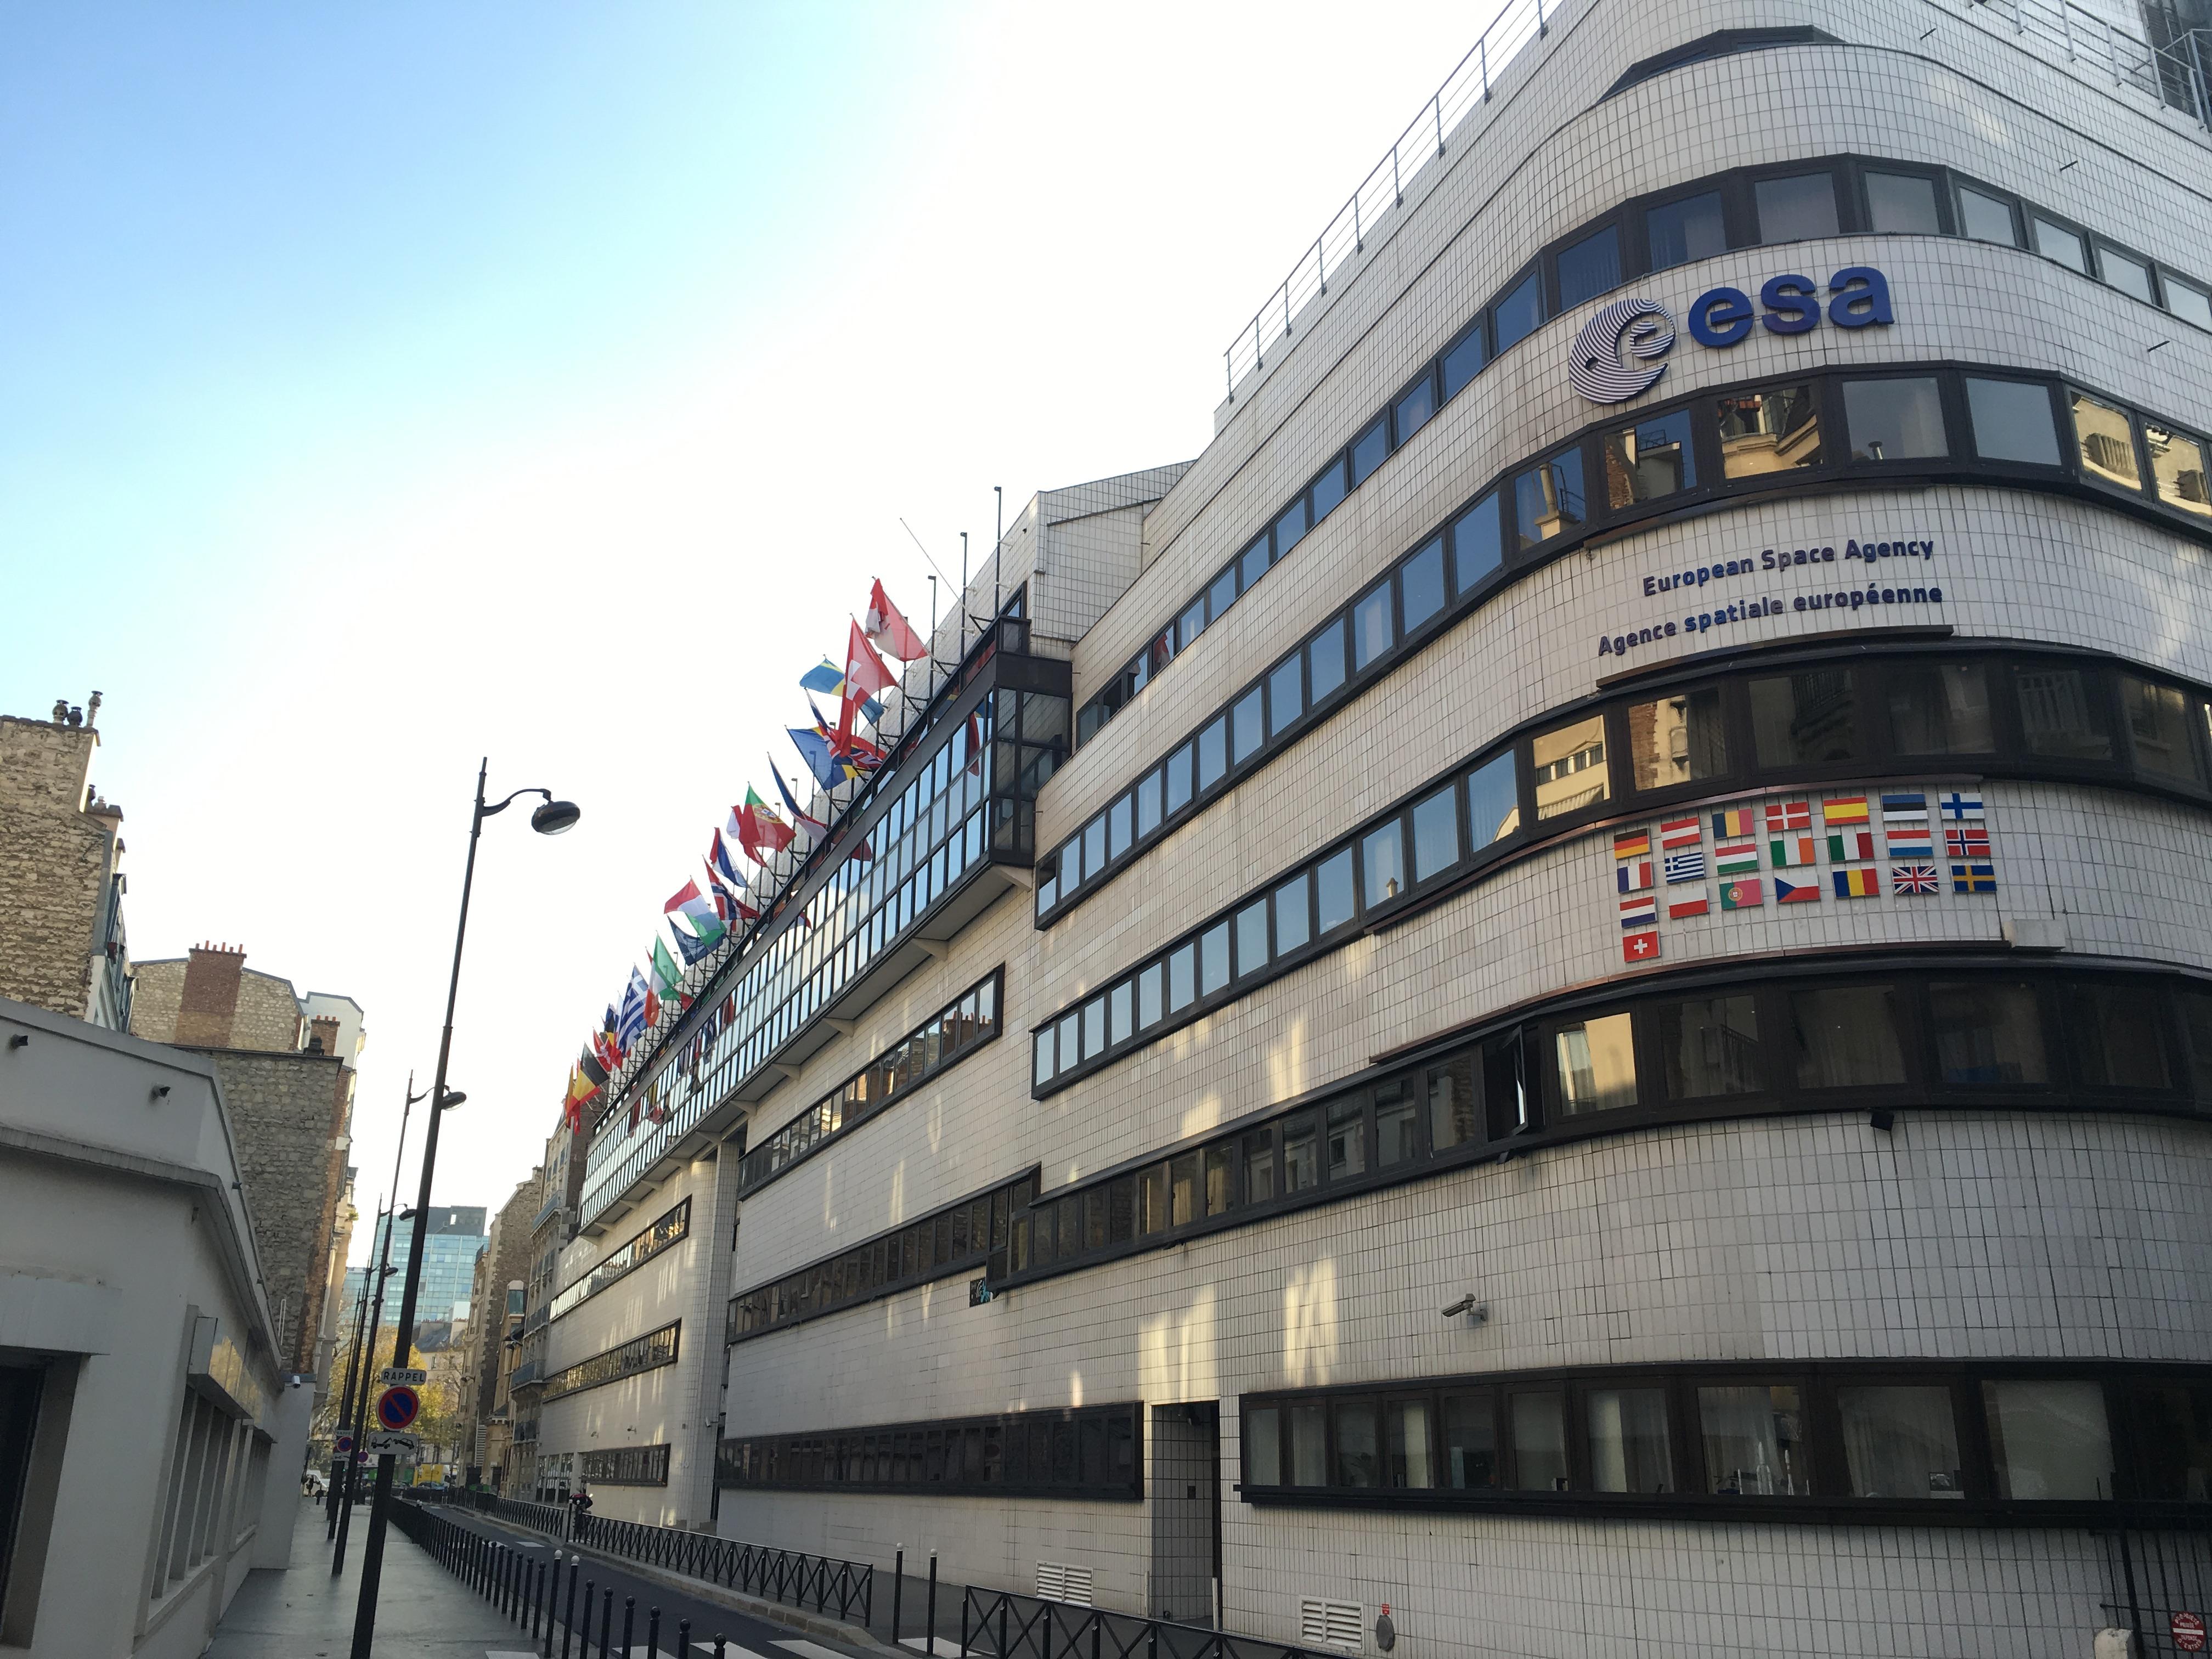 File:ESA Headquarters in Paris, France.JPG - Wikimedia Commons